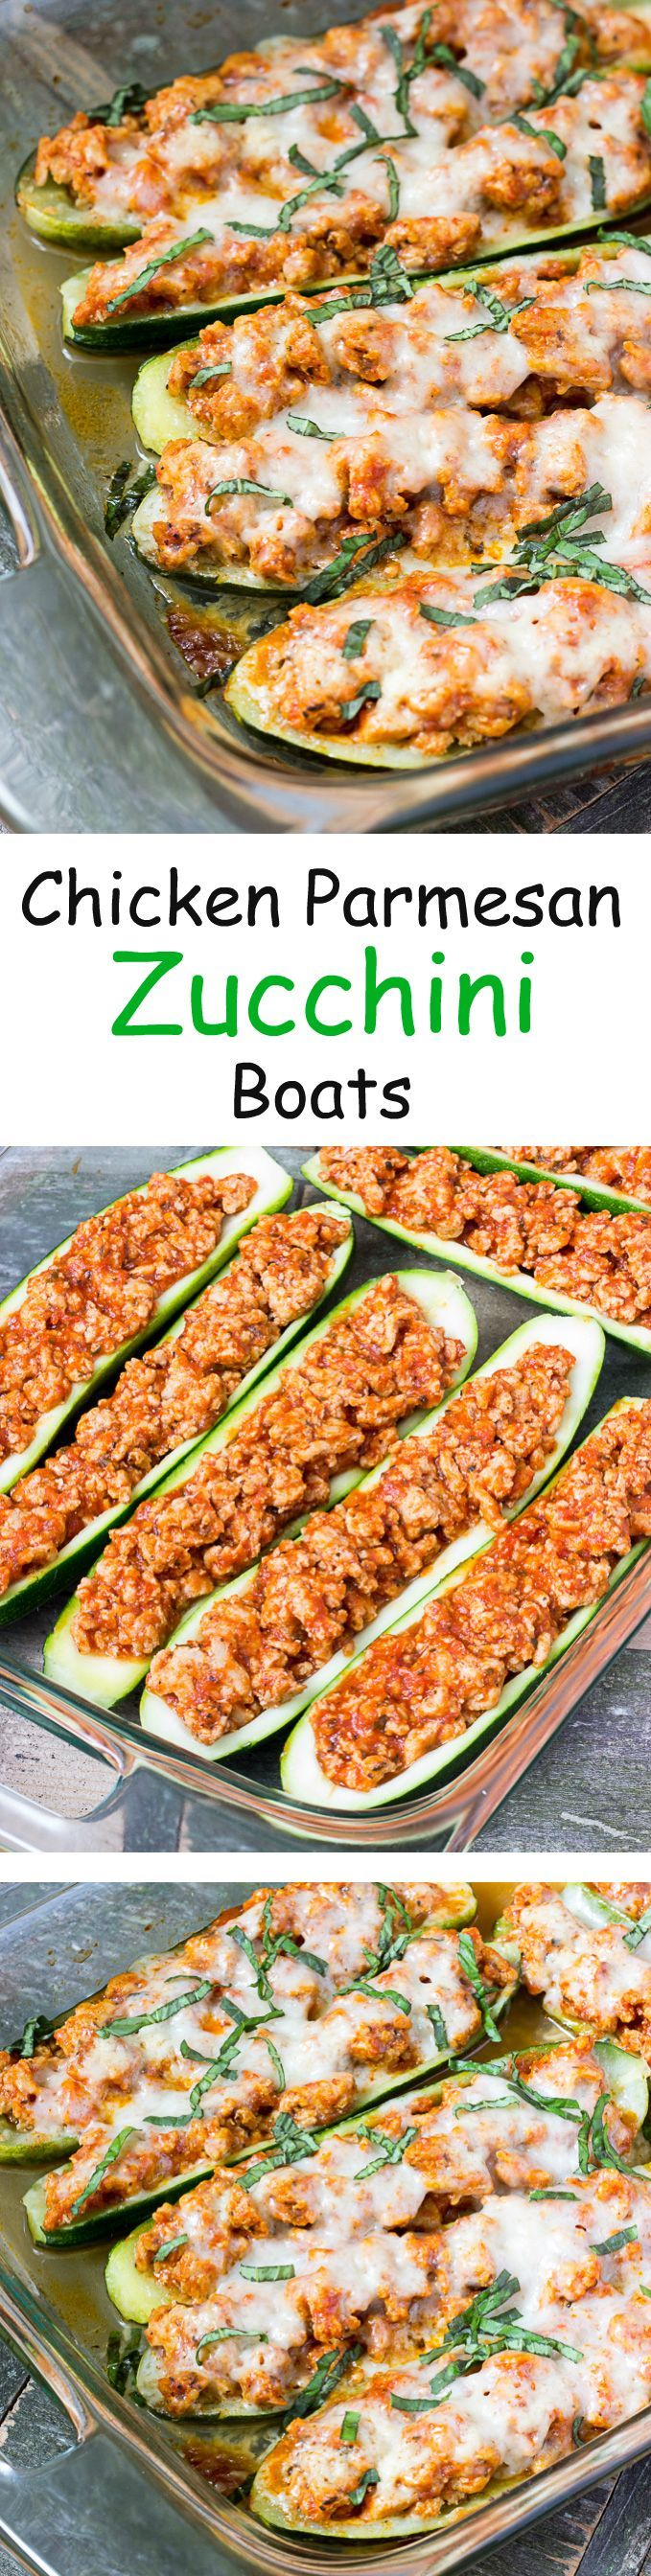 Chicken Parmesan Zucchini Boats - stuffed zucchini filled with chicken, pasta sauce, mozzarella, and parmesan cheese